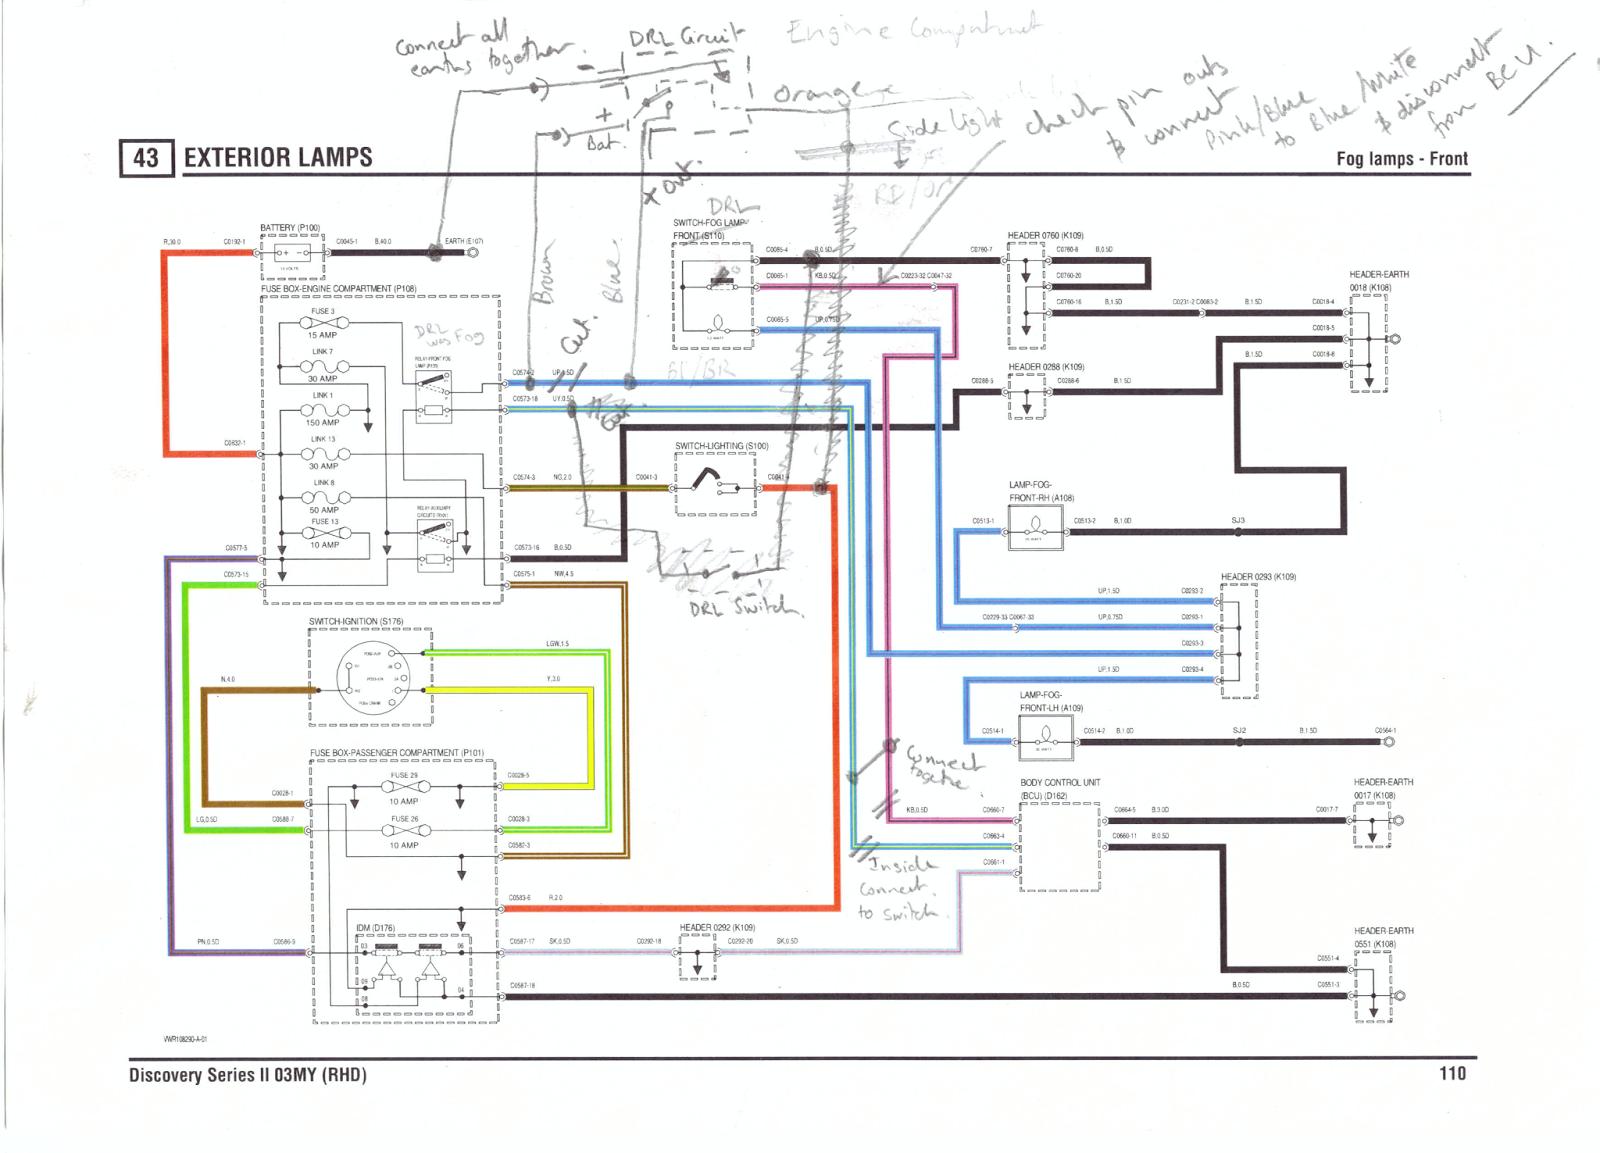 [DIAGRAM_3ER]  Rover Clipper Wiring Diagram - 2002 Toyota Sequoia Wiring Harness Diagram  for Wiring Diagram Schematics | Rover Streetwise Wiring Diagram |  | Wiring Diagram Schematics